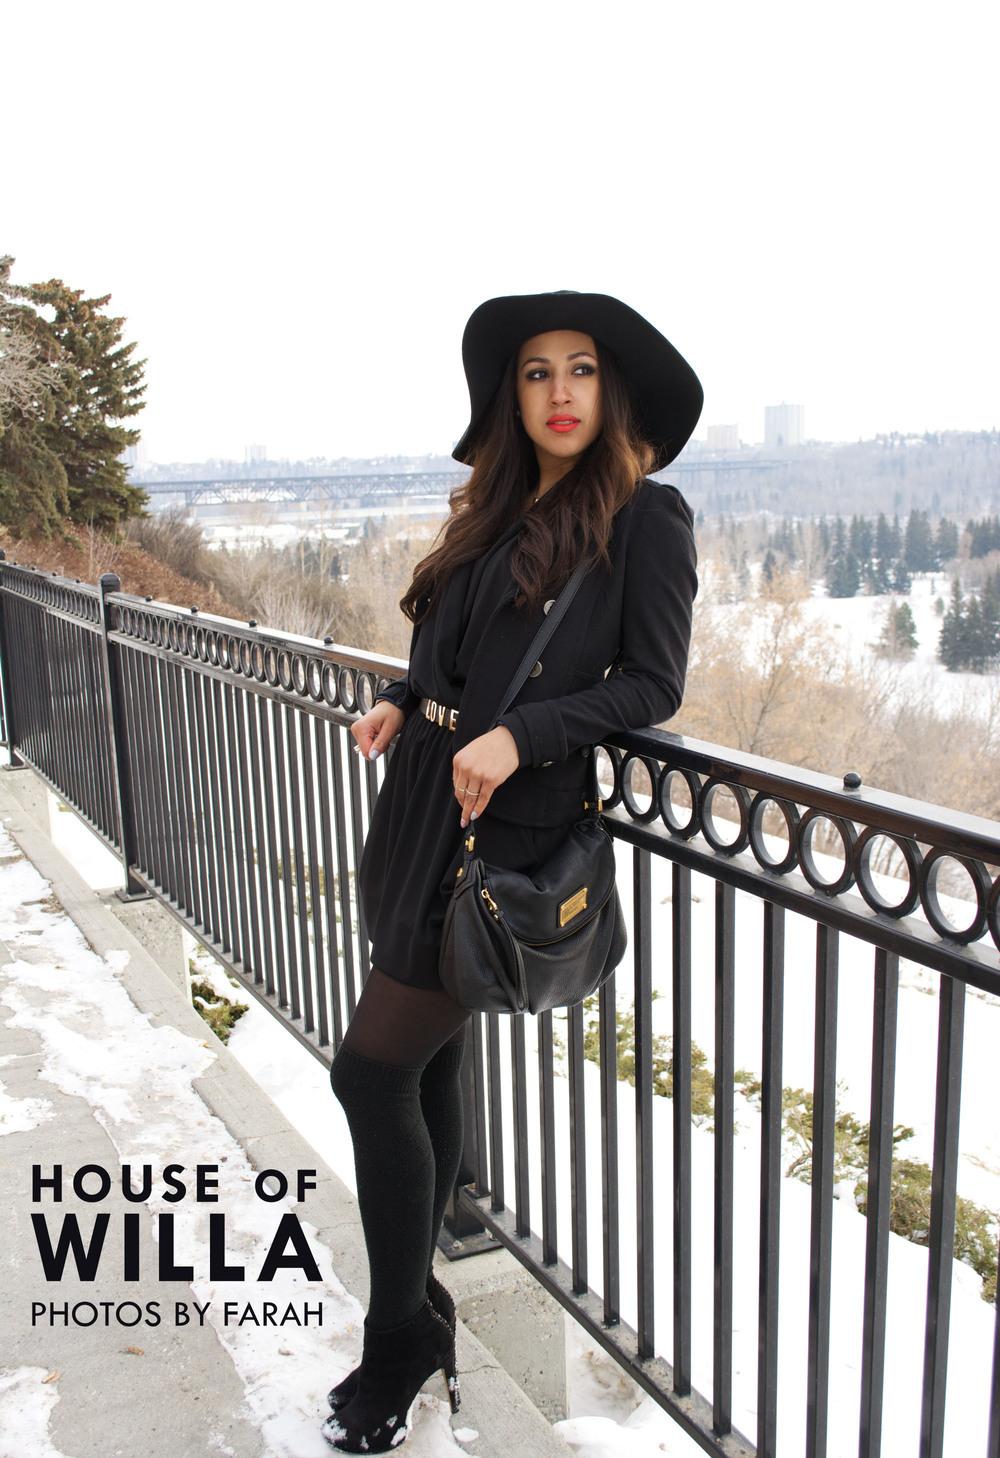 houseofwilla_amour.jpg